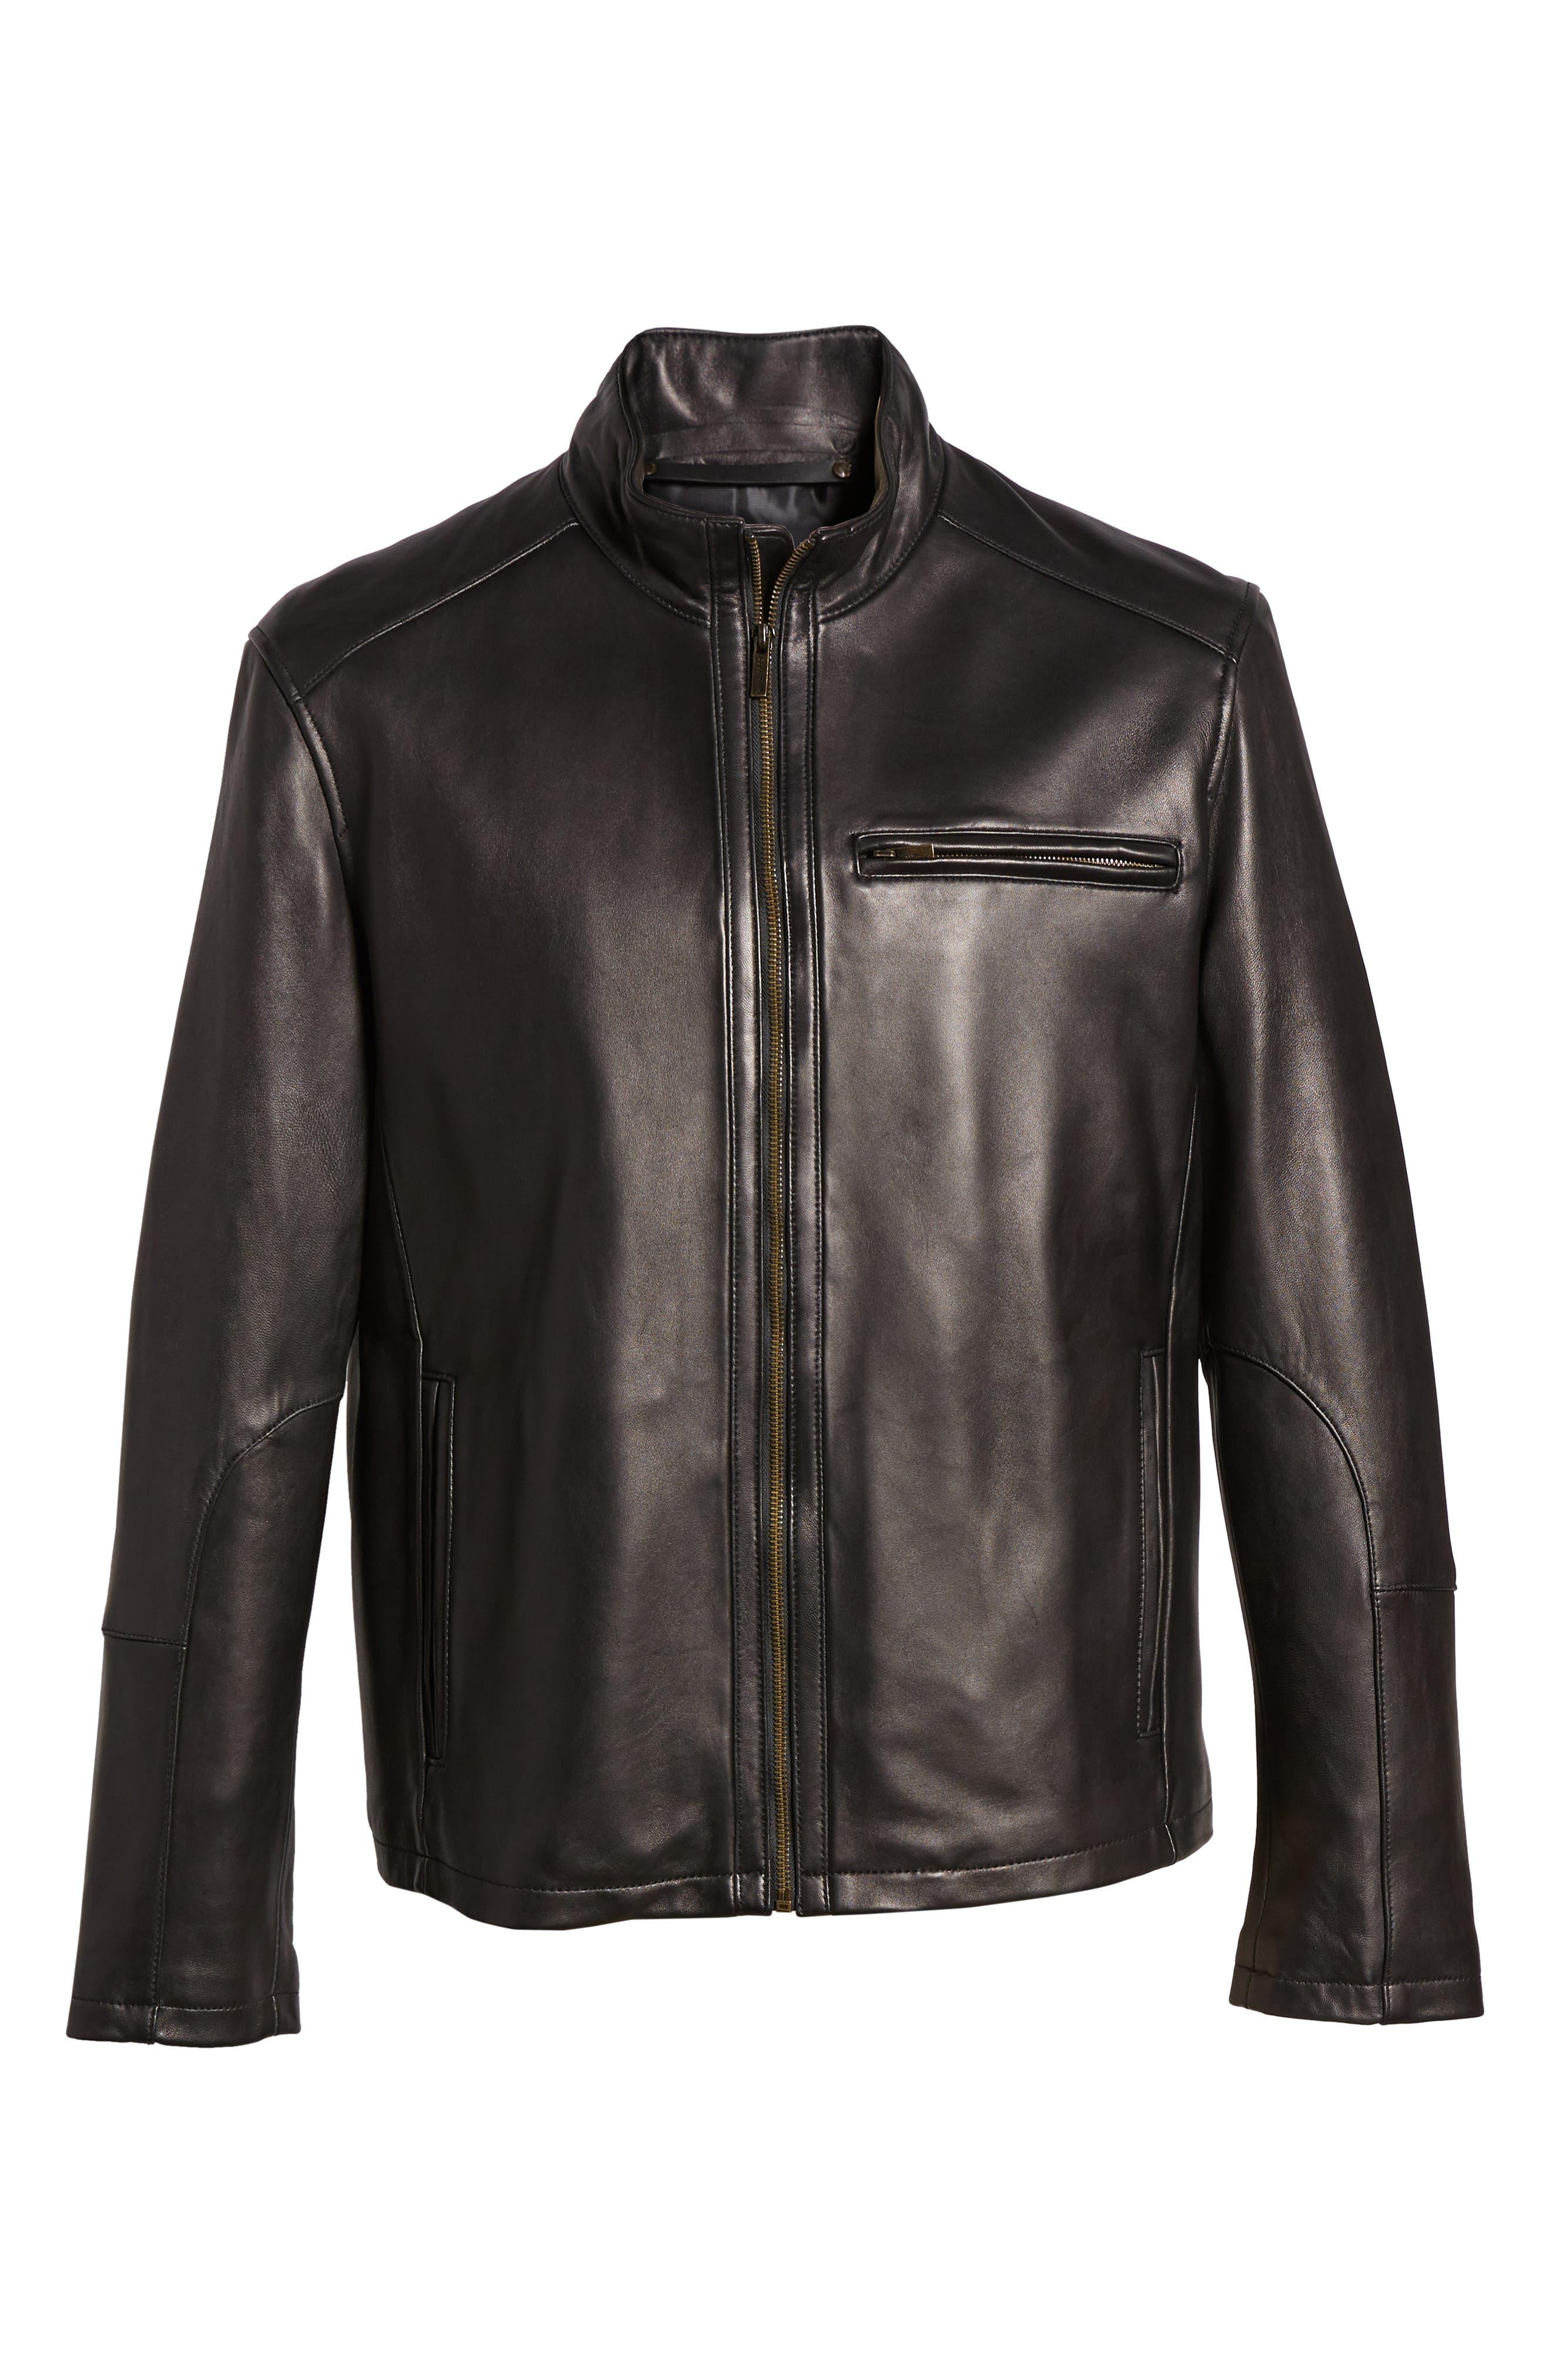 COLE HAAN,                             Lambskin Leather Moto Jacket,                             Alternate thumbnail 2, color,                             BLACK